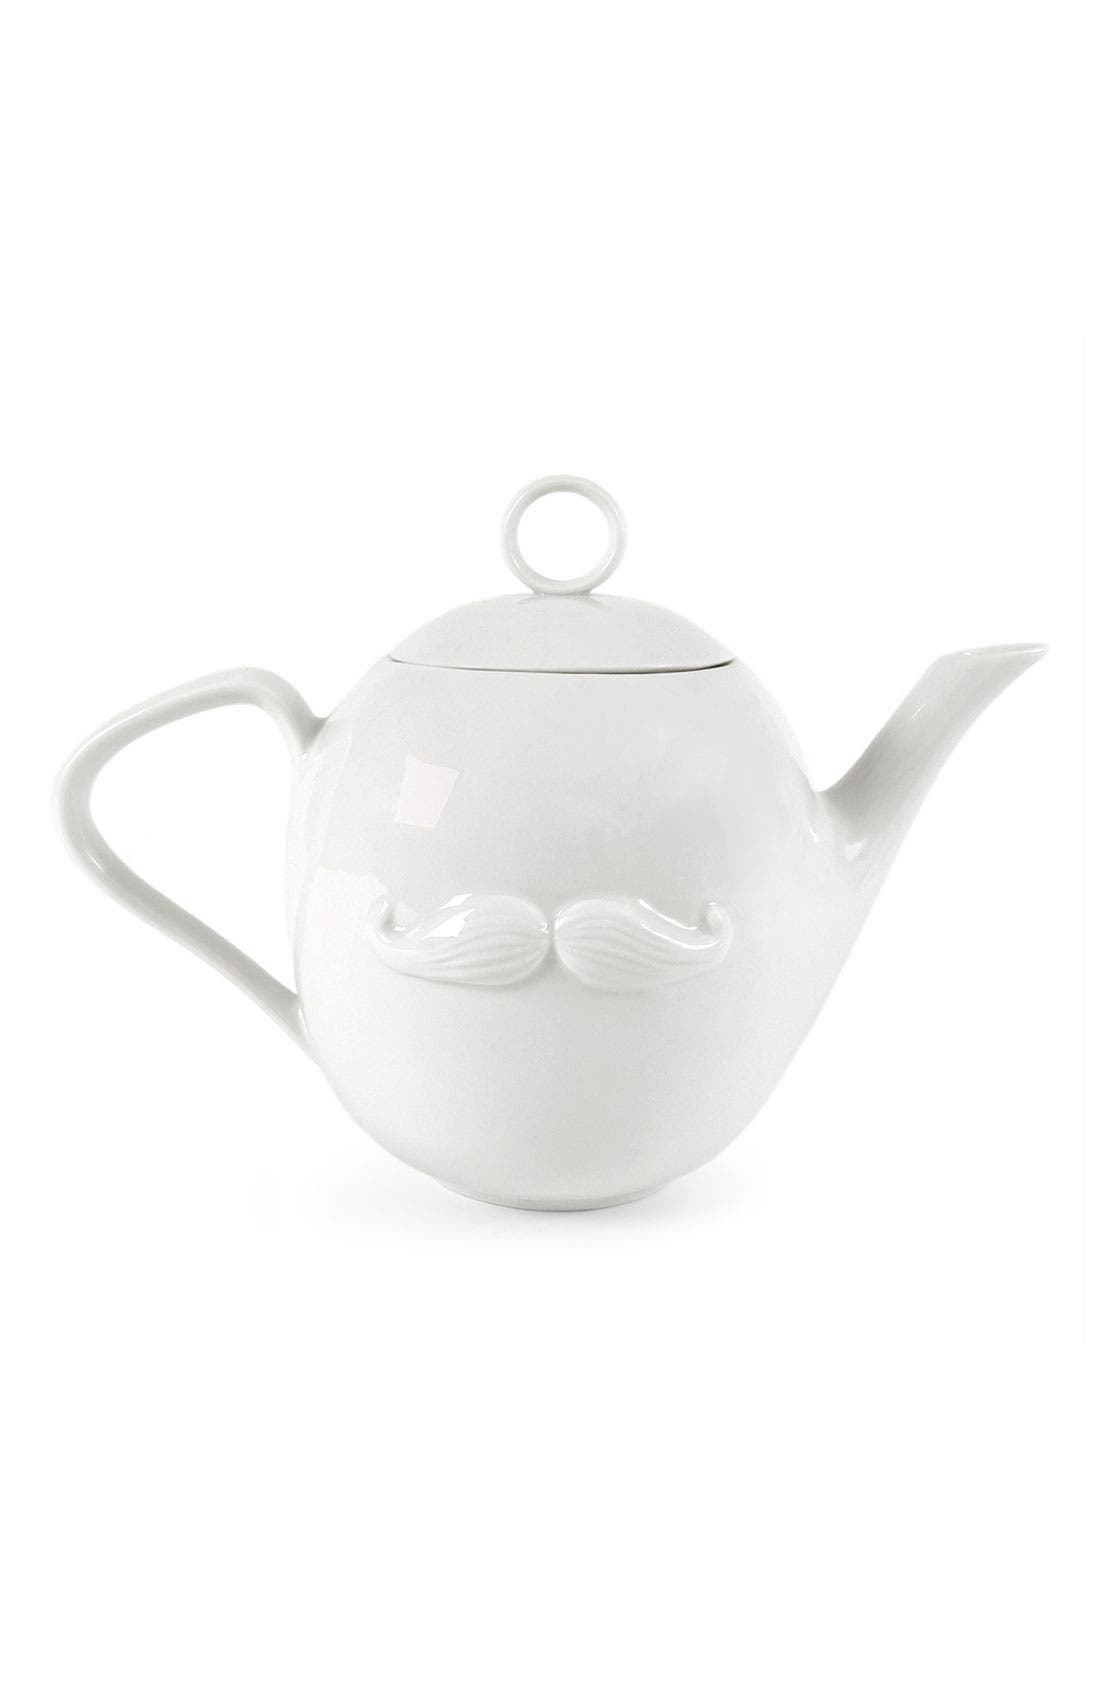 Alternate Image 1 Selected - Jonathan Adler 'Muse' Porcelain Teapot